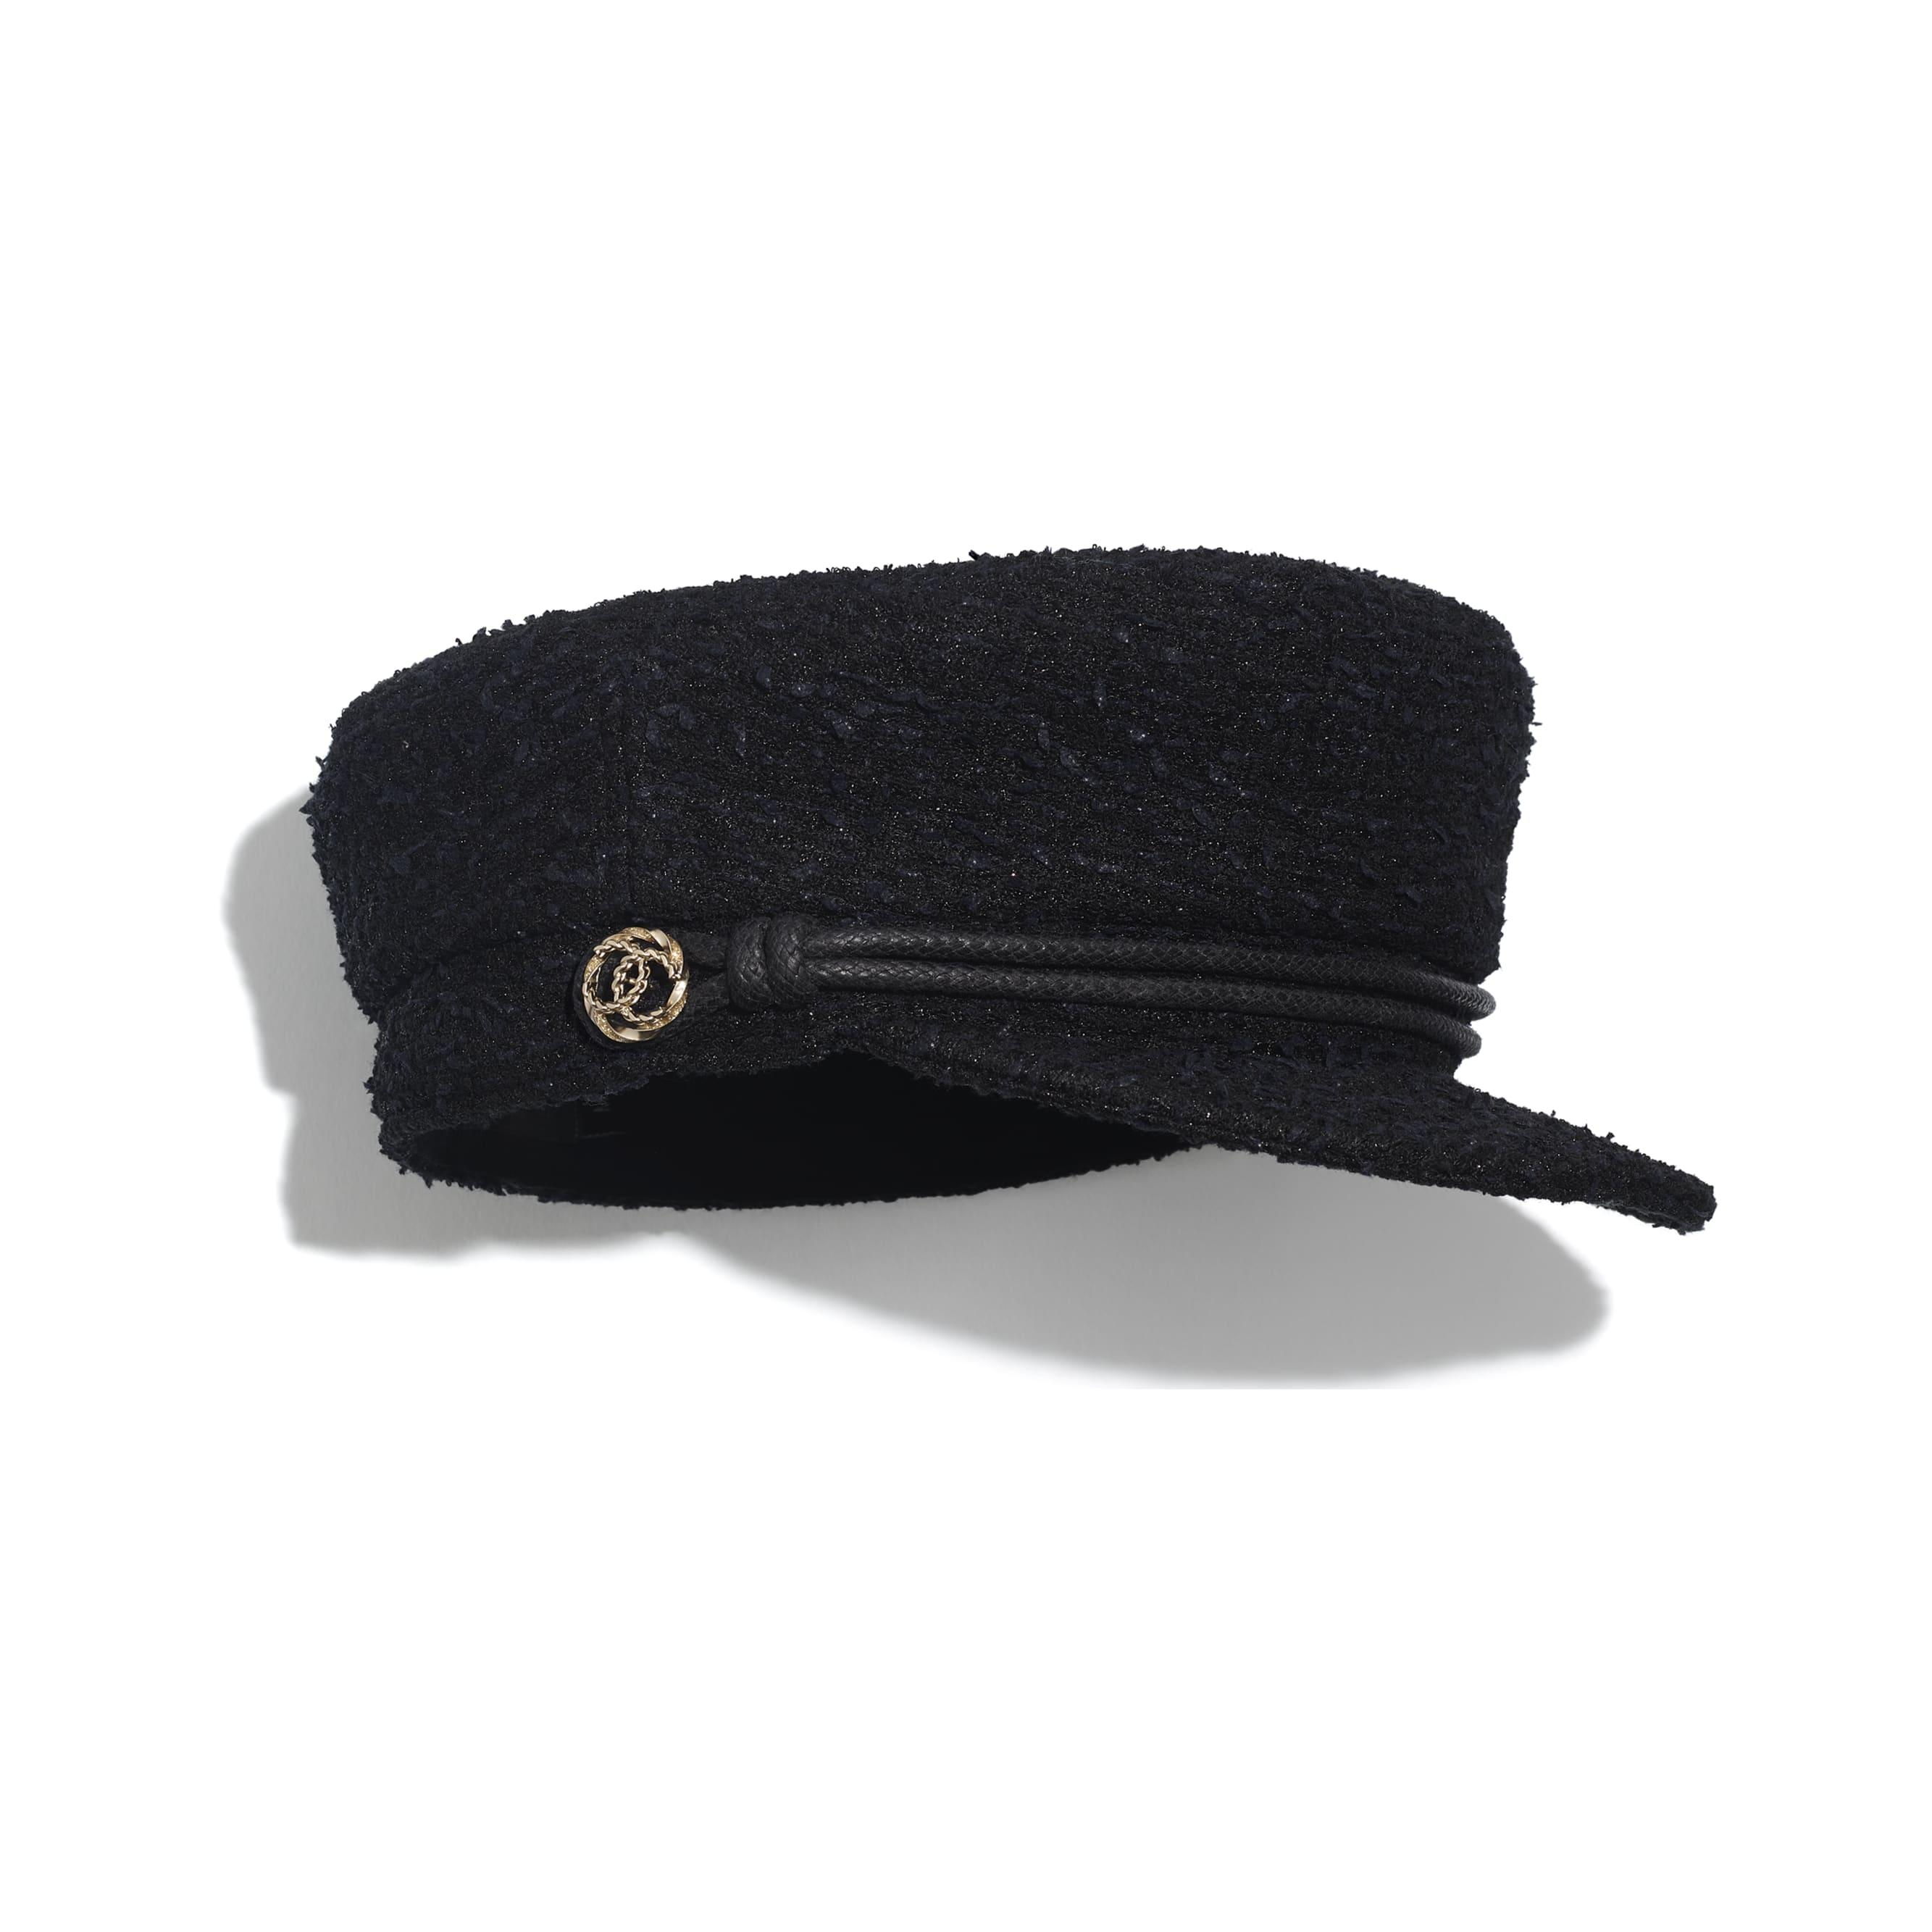 Sailor Cap - Black - Tweed & Metal - CHANEL - Alternative view - see standard sized version